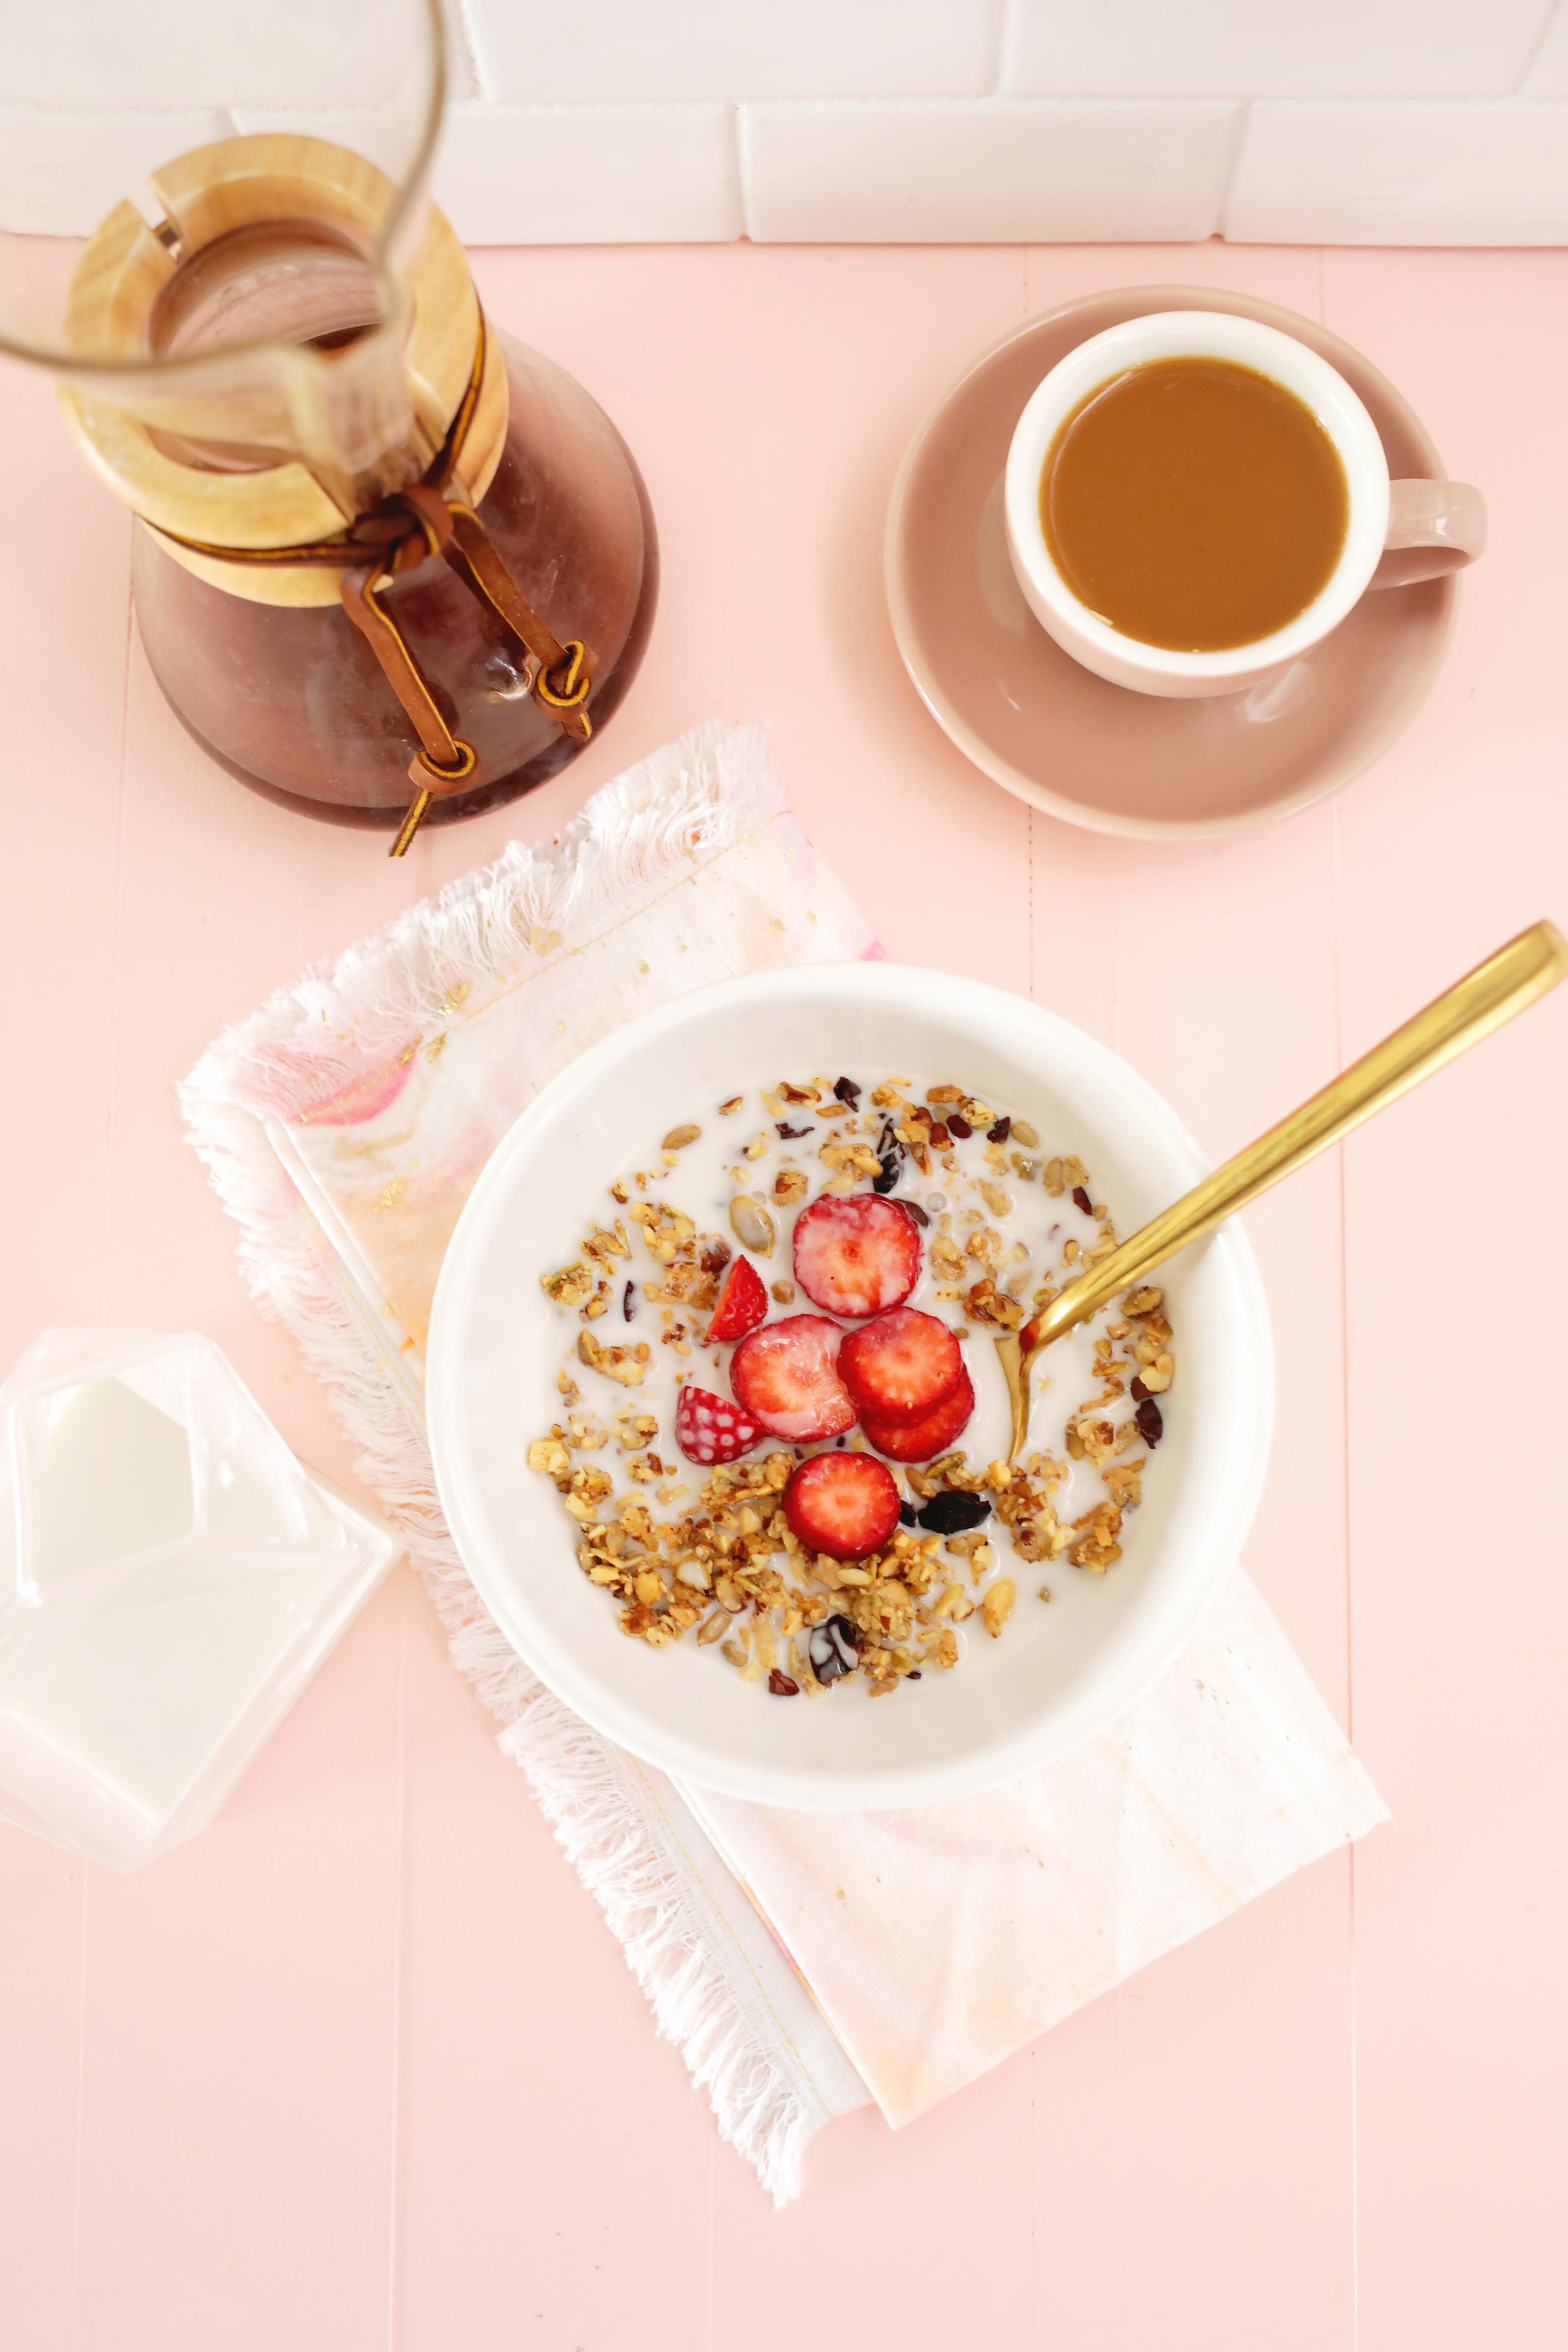 Easy Grain-Free Granola (Paleo and Gluten-Free!)